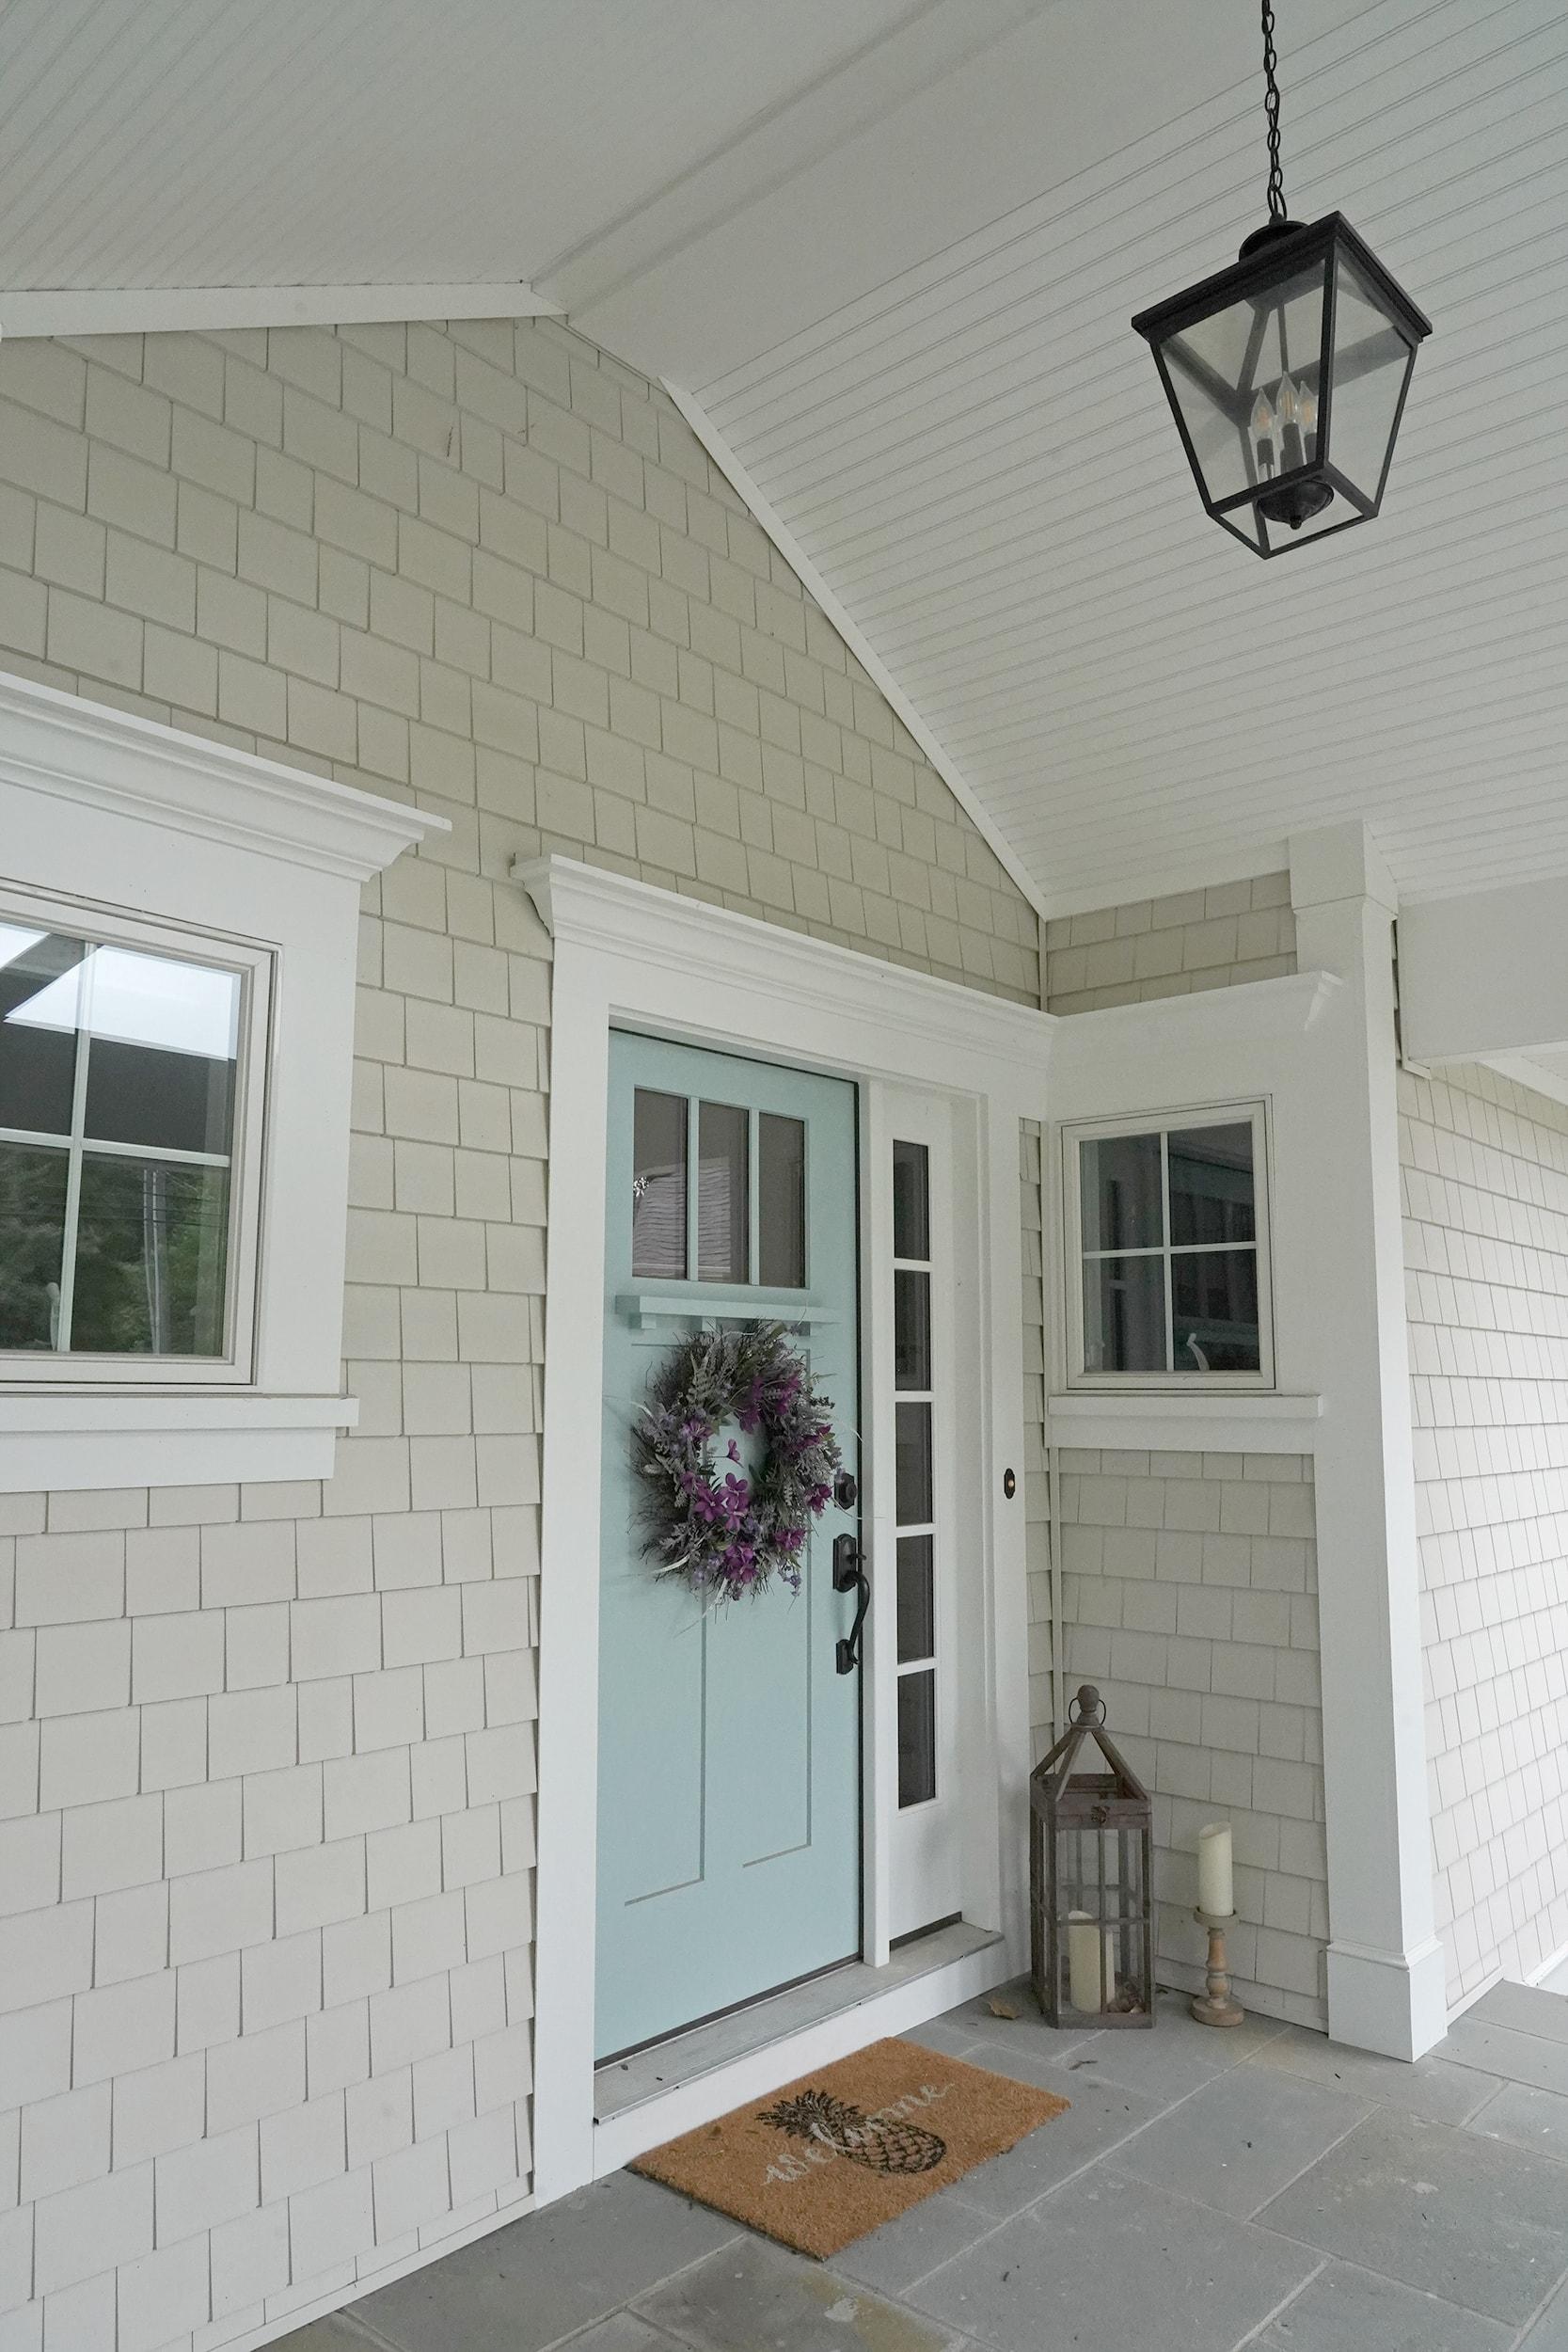 yost-home-improvements-ranch-exterior-6-min